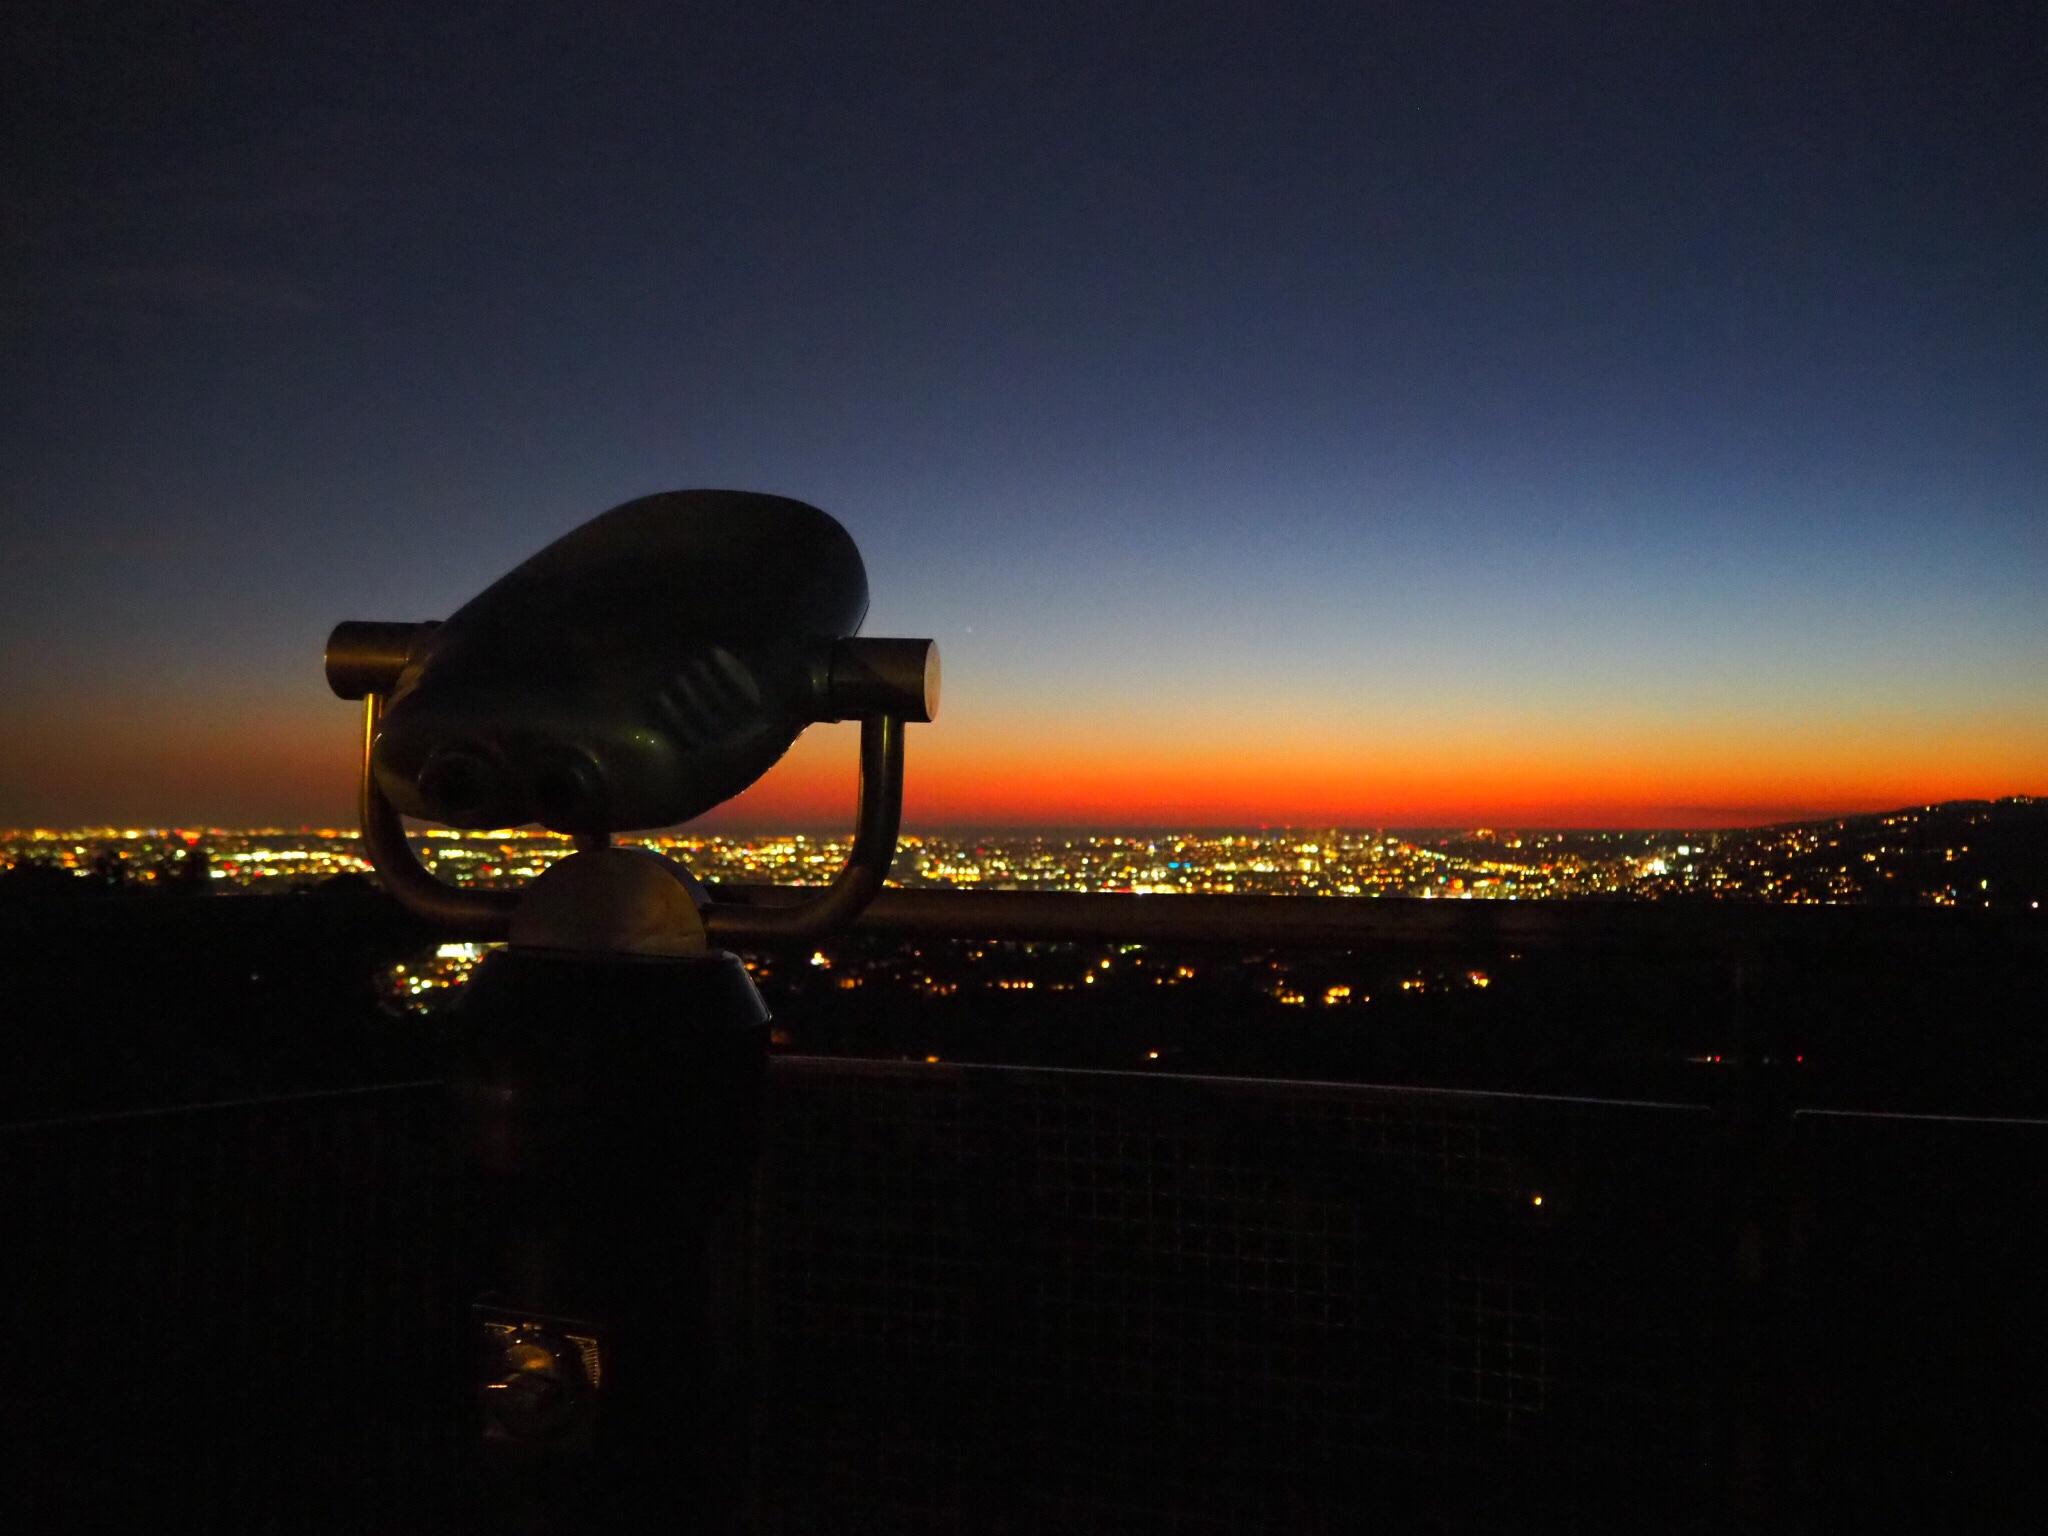 img 2385 - 24hours in LA - ロサンゼルスで過ごした24時間